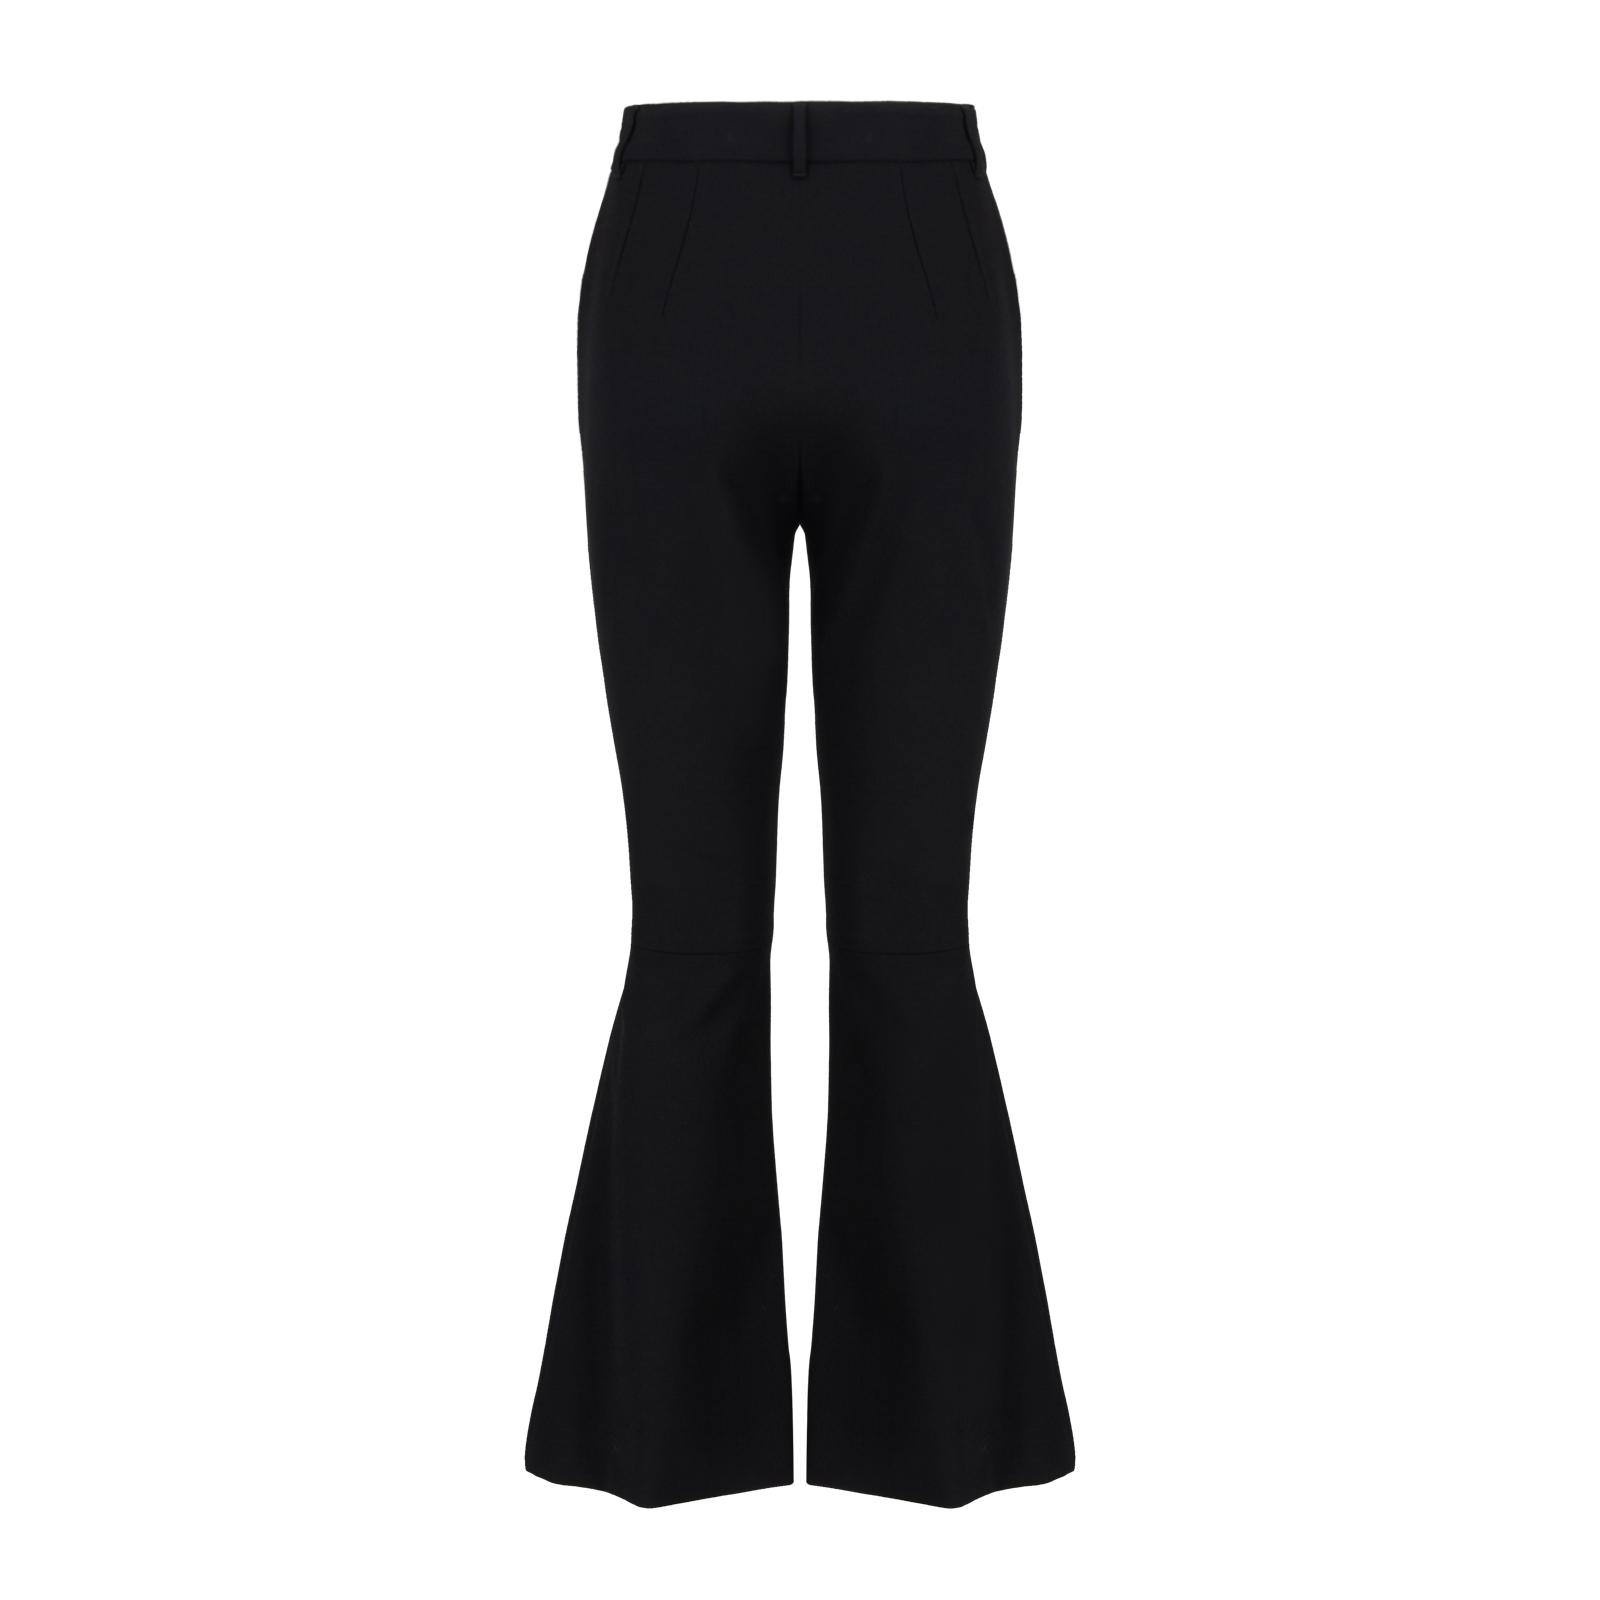 Dettagli su Dolce & Gabbana Pantaloni A Zampa Di Elefante In Lana Tinta Unita